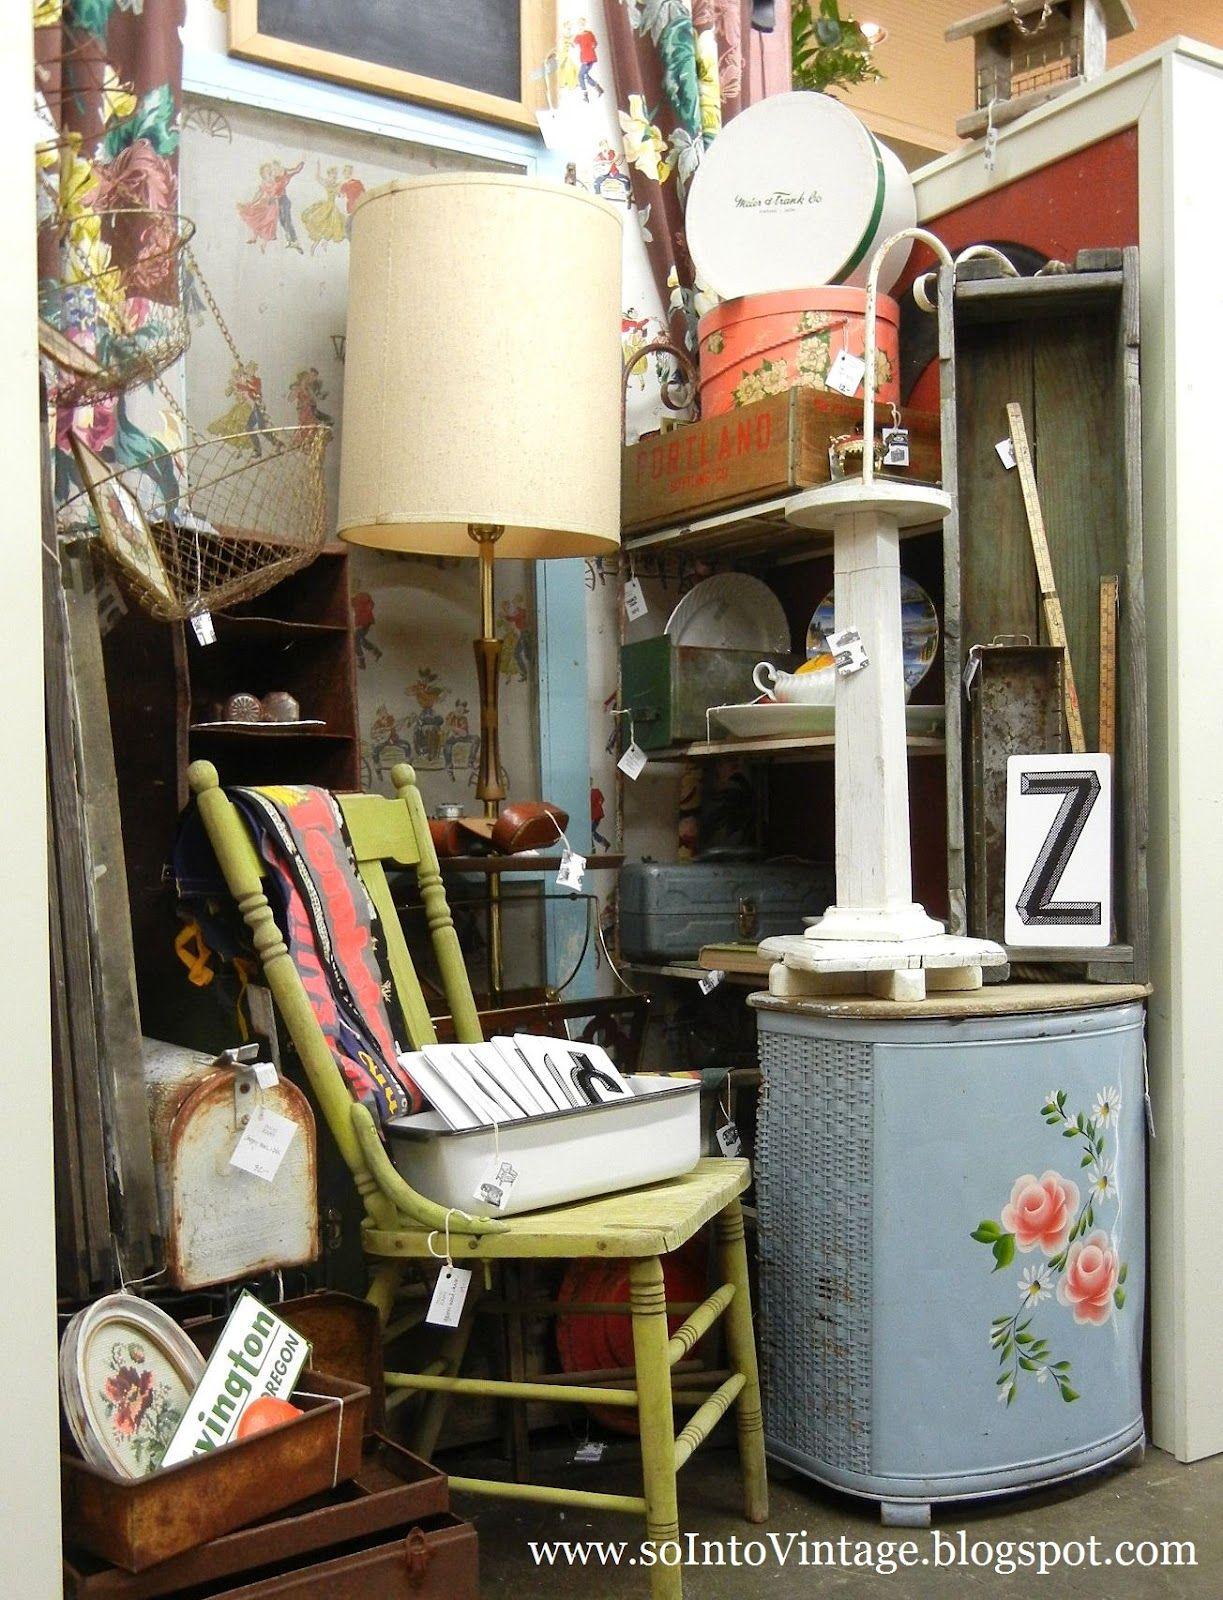 5-17-12 (a friend's flea market booth in Oregon) | Display